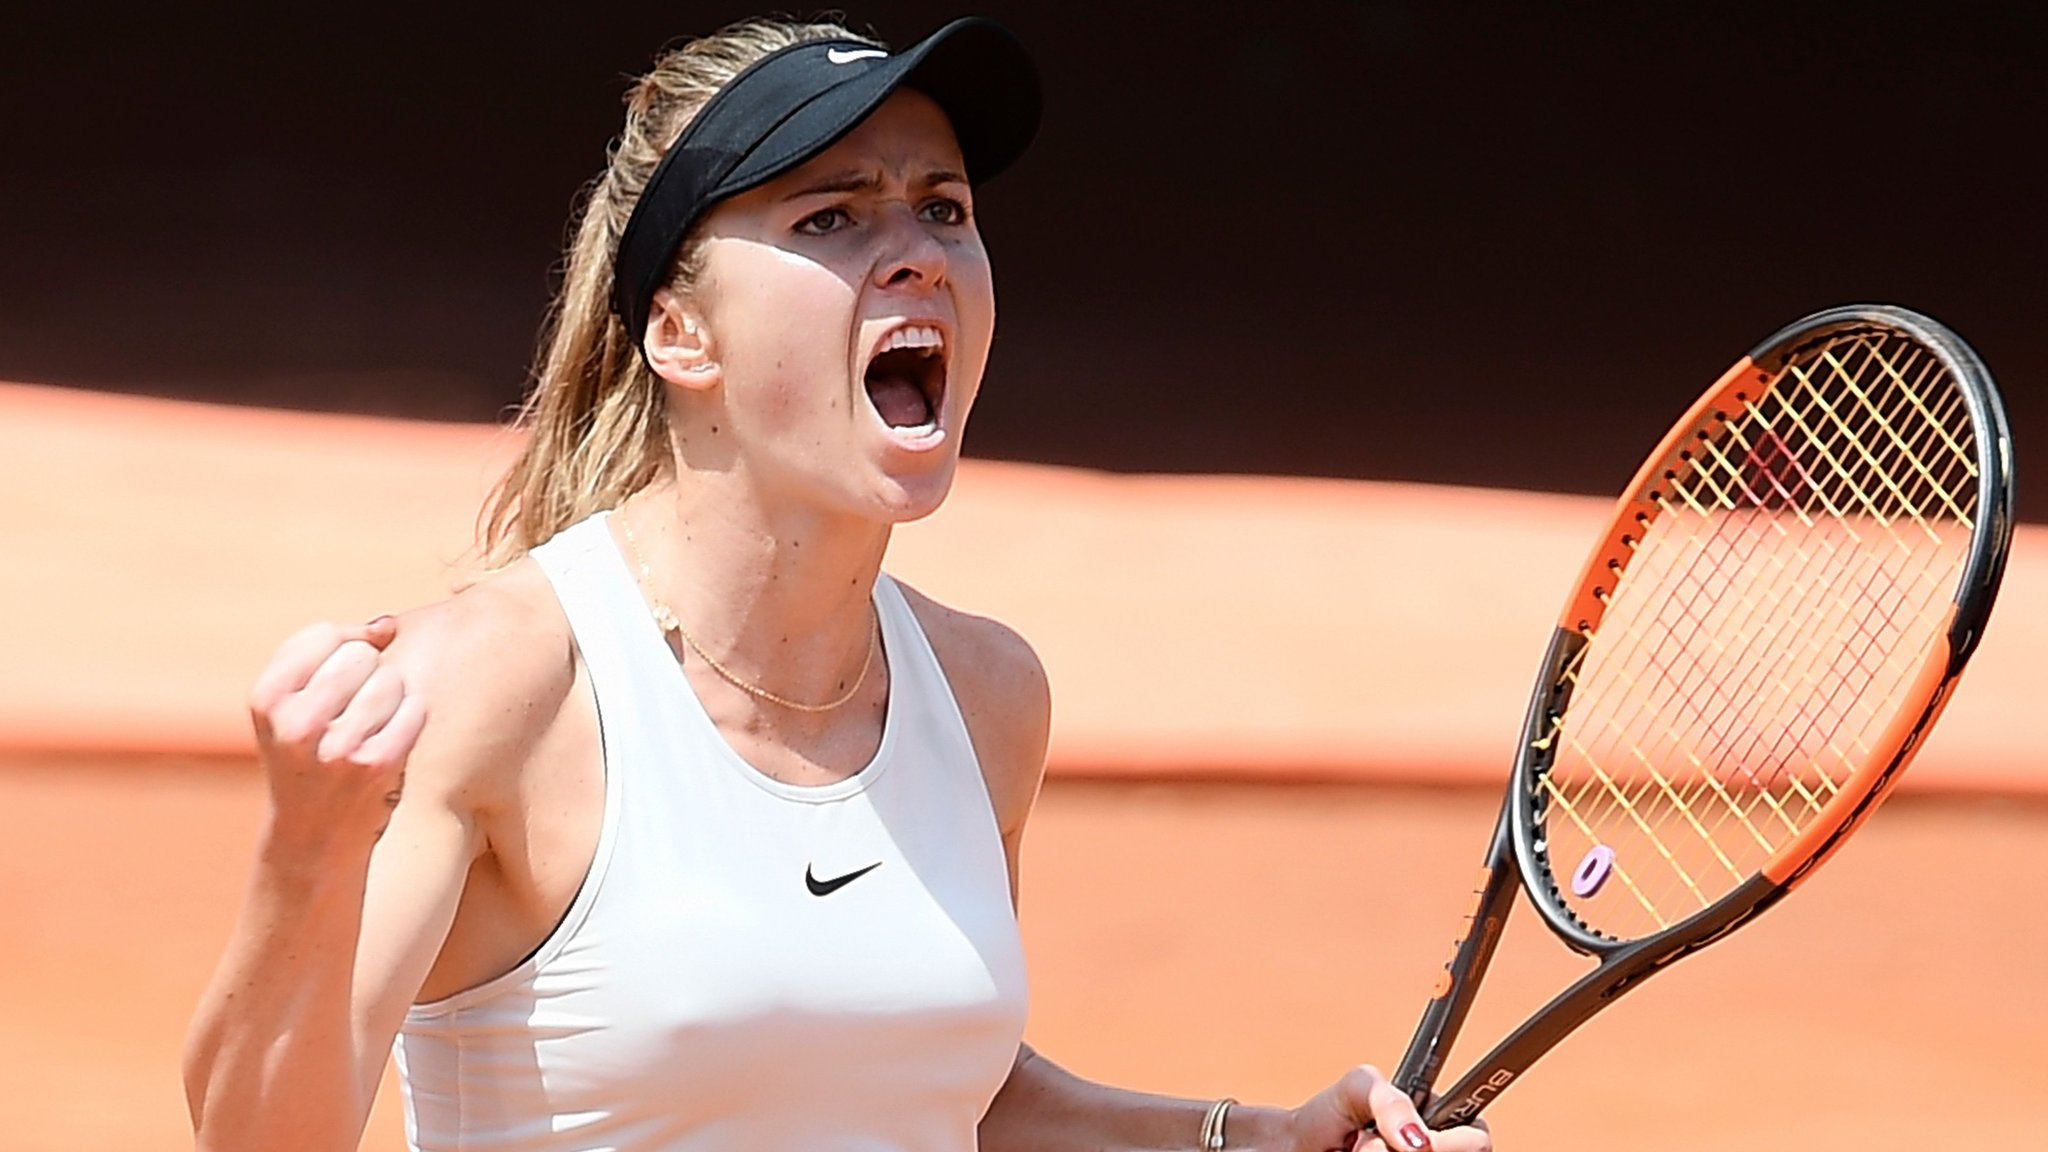 Svitolina overwhelms Halep to win Italian Open